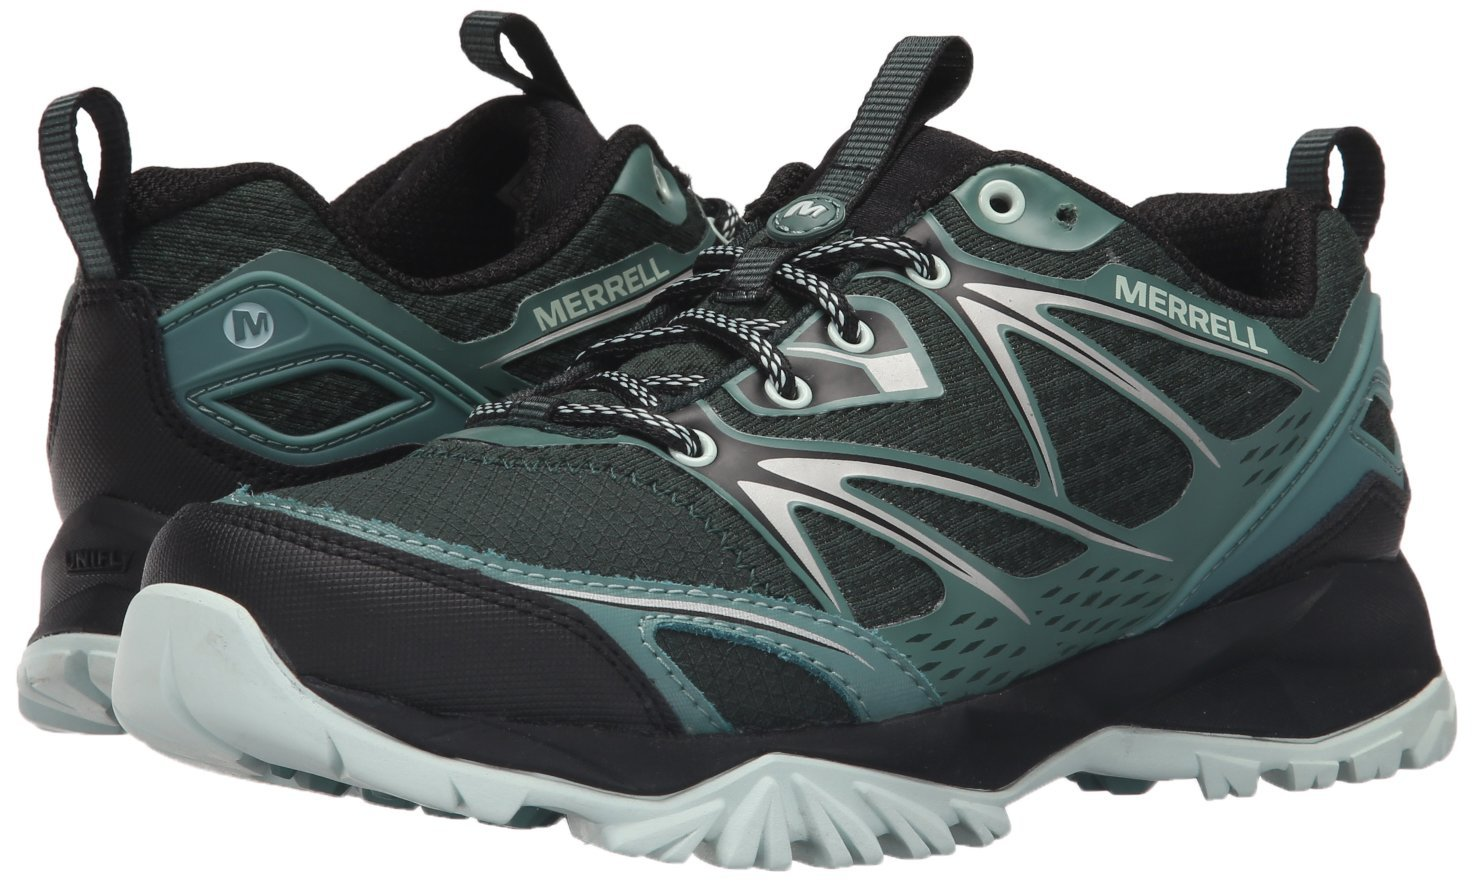 Merrell Women's Capra Bolt B(M) Hiking Shoe B01AMSM4LM 8.5 B(M) Bolt US|Pine Grove b27e85